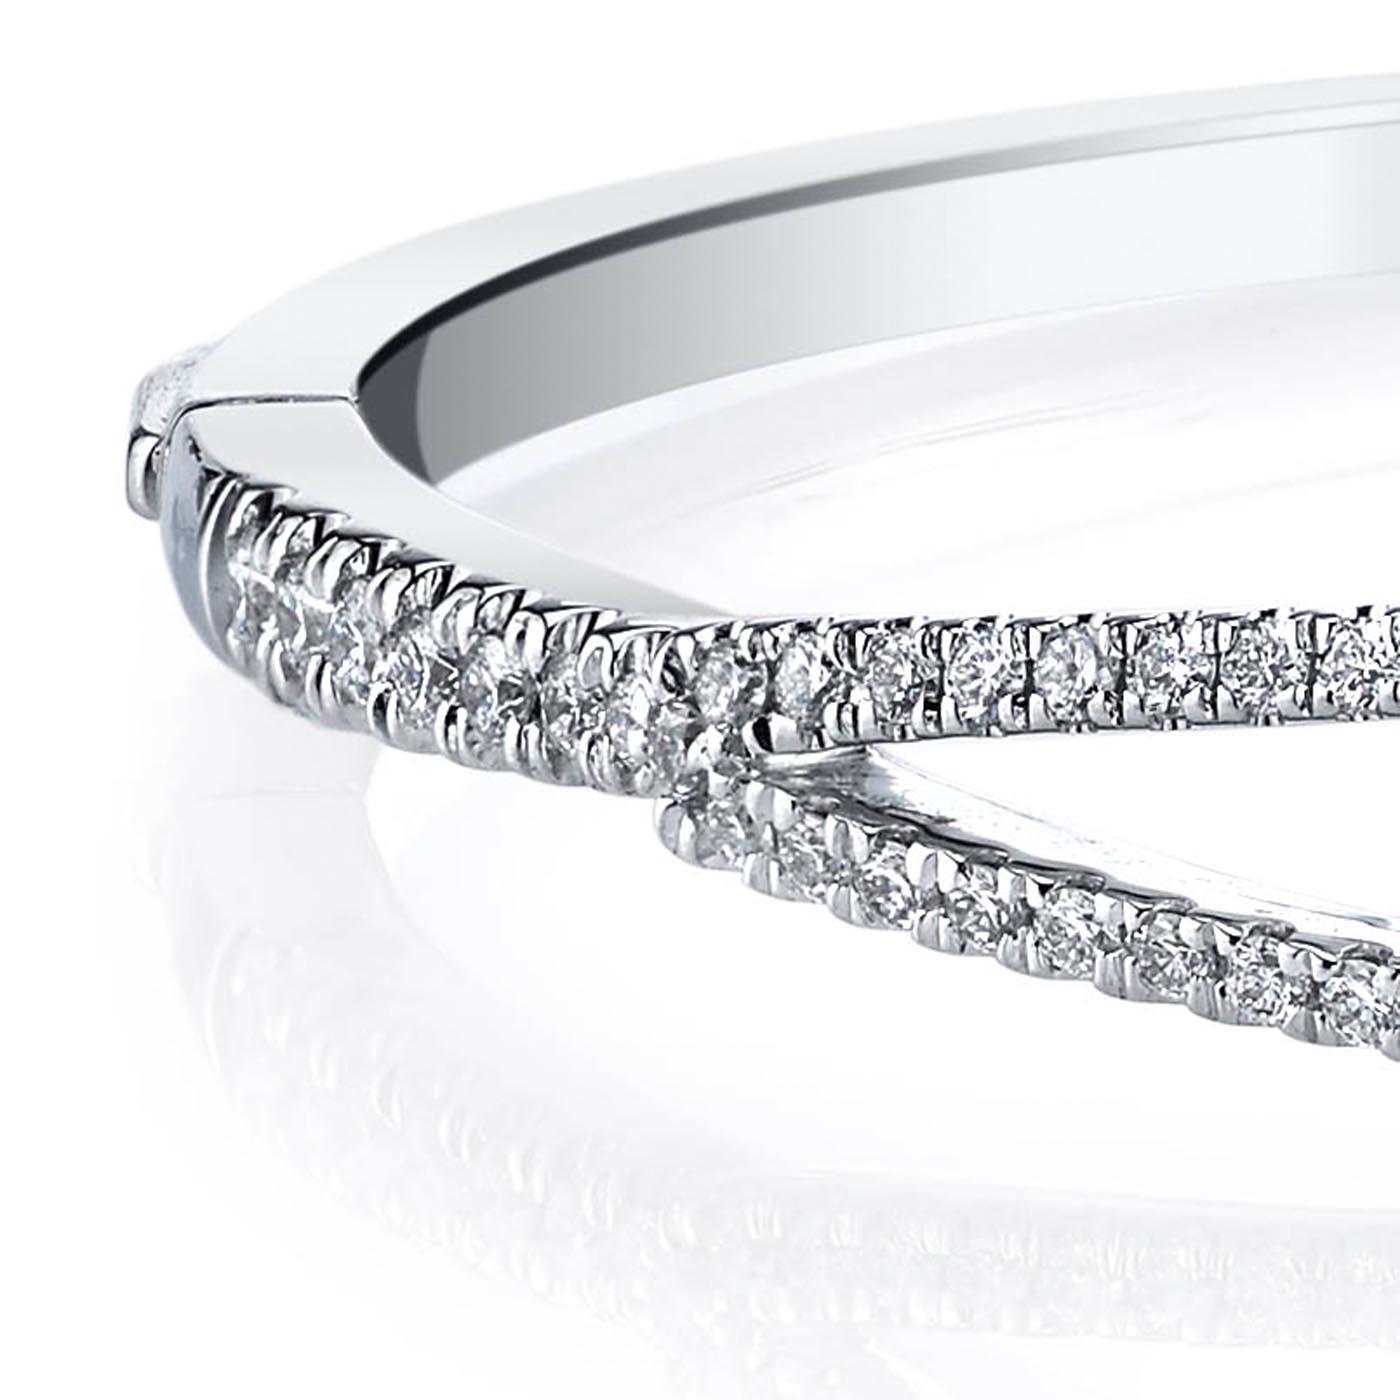 Diamond Bracelet - Bangles & Cuffs Style #: MARS-26722